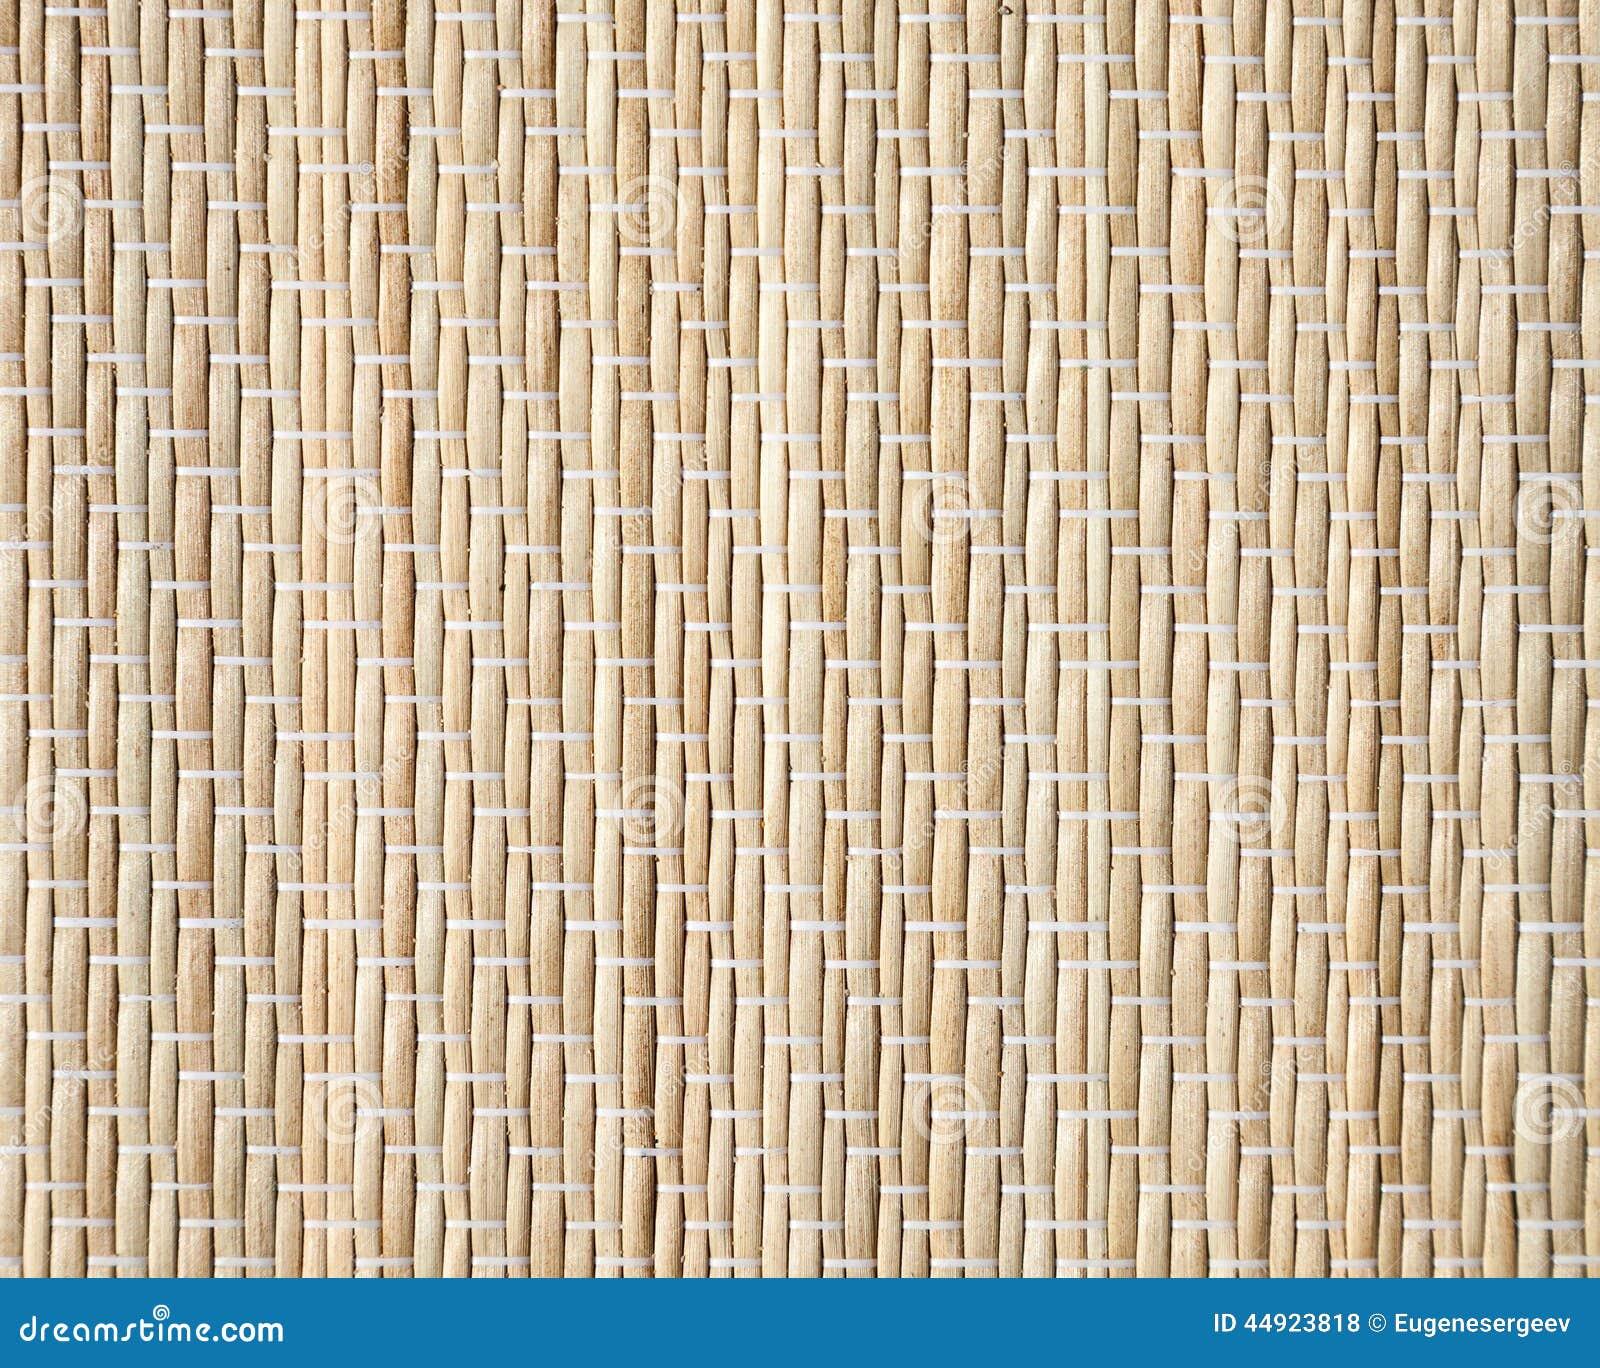 Bamboo mat, closeup detailed background texture